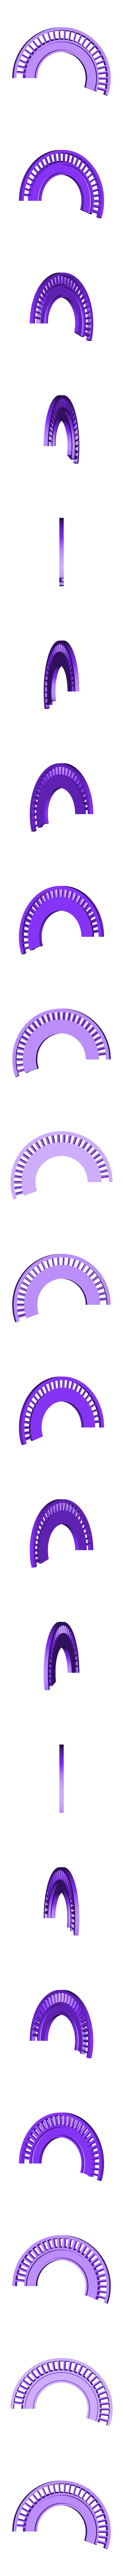 Turbine-IP-NGV01.stl Download free STL file Turboprop Engine • 3D printable model, konchan77